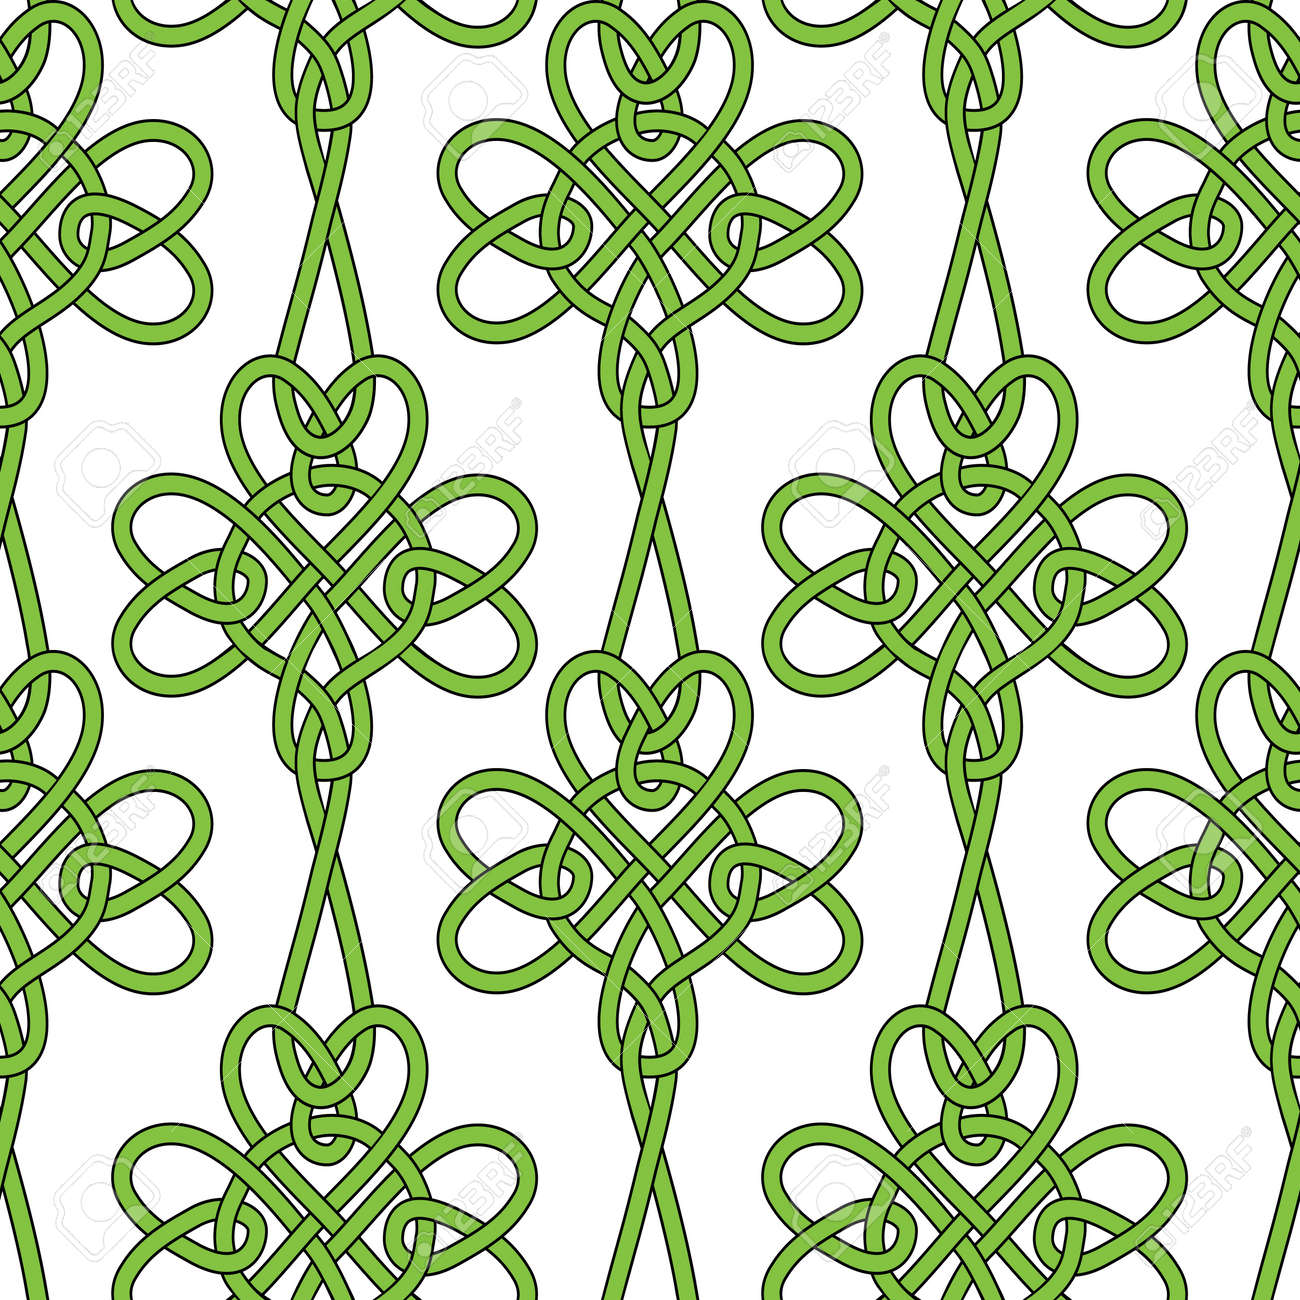 Seamless flower shamrock clover vector leaves background for St. Patrick's Day. Irish illustration. Retro vintage keltik wallpaper. Texture vector illustration. Pattern celtic style. Stock Vector - 18075306